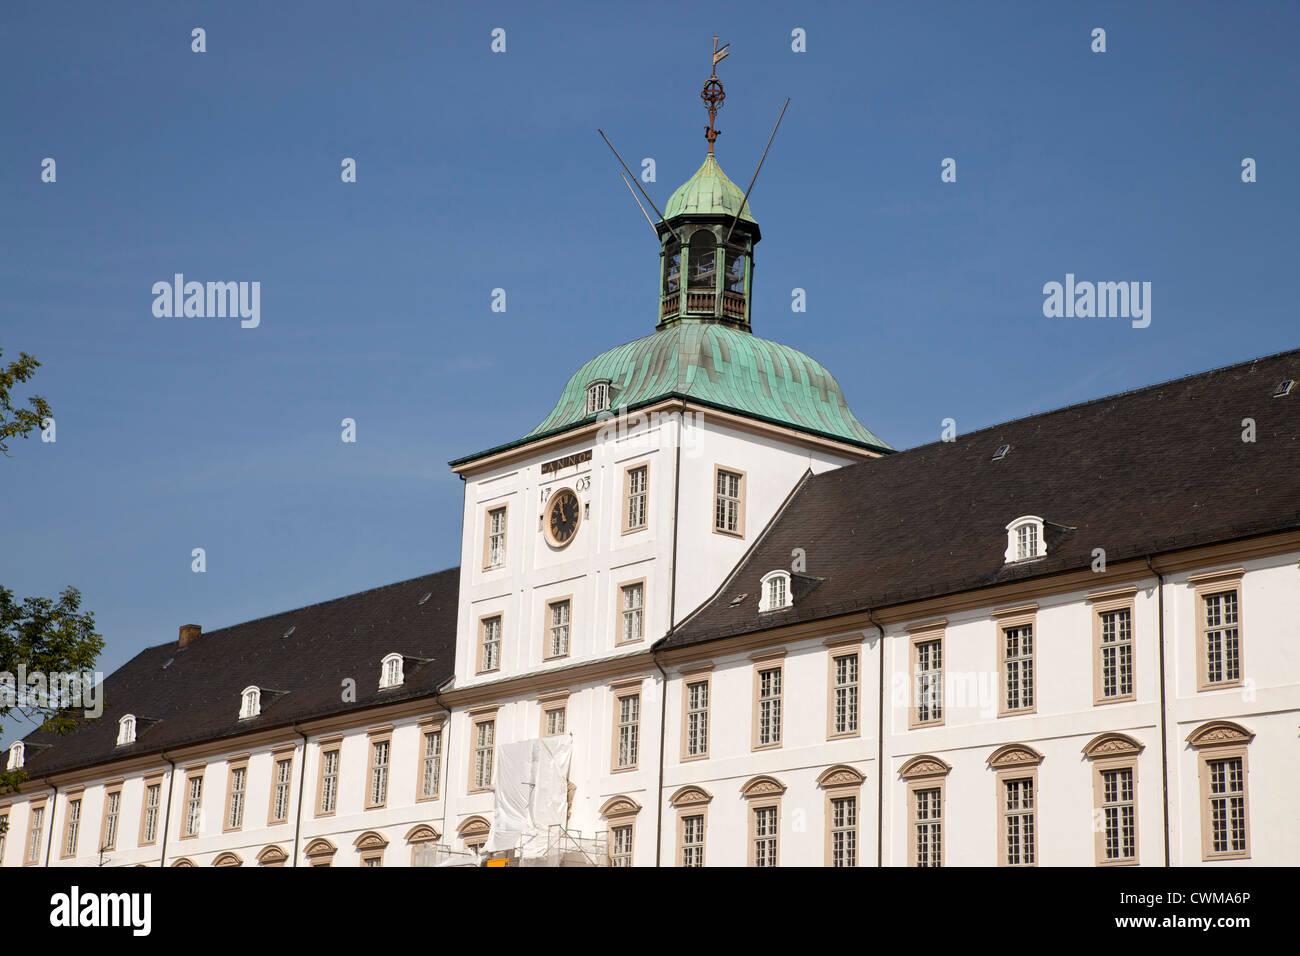 Gottorf Castle, Schleswig, Schleswig-Holstein, Germany, Europe - Stock Image